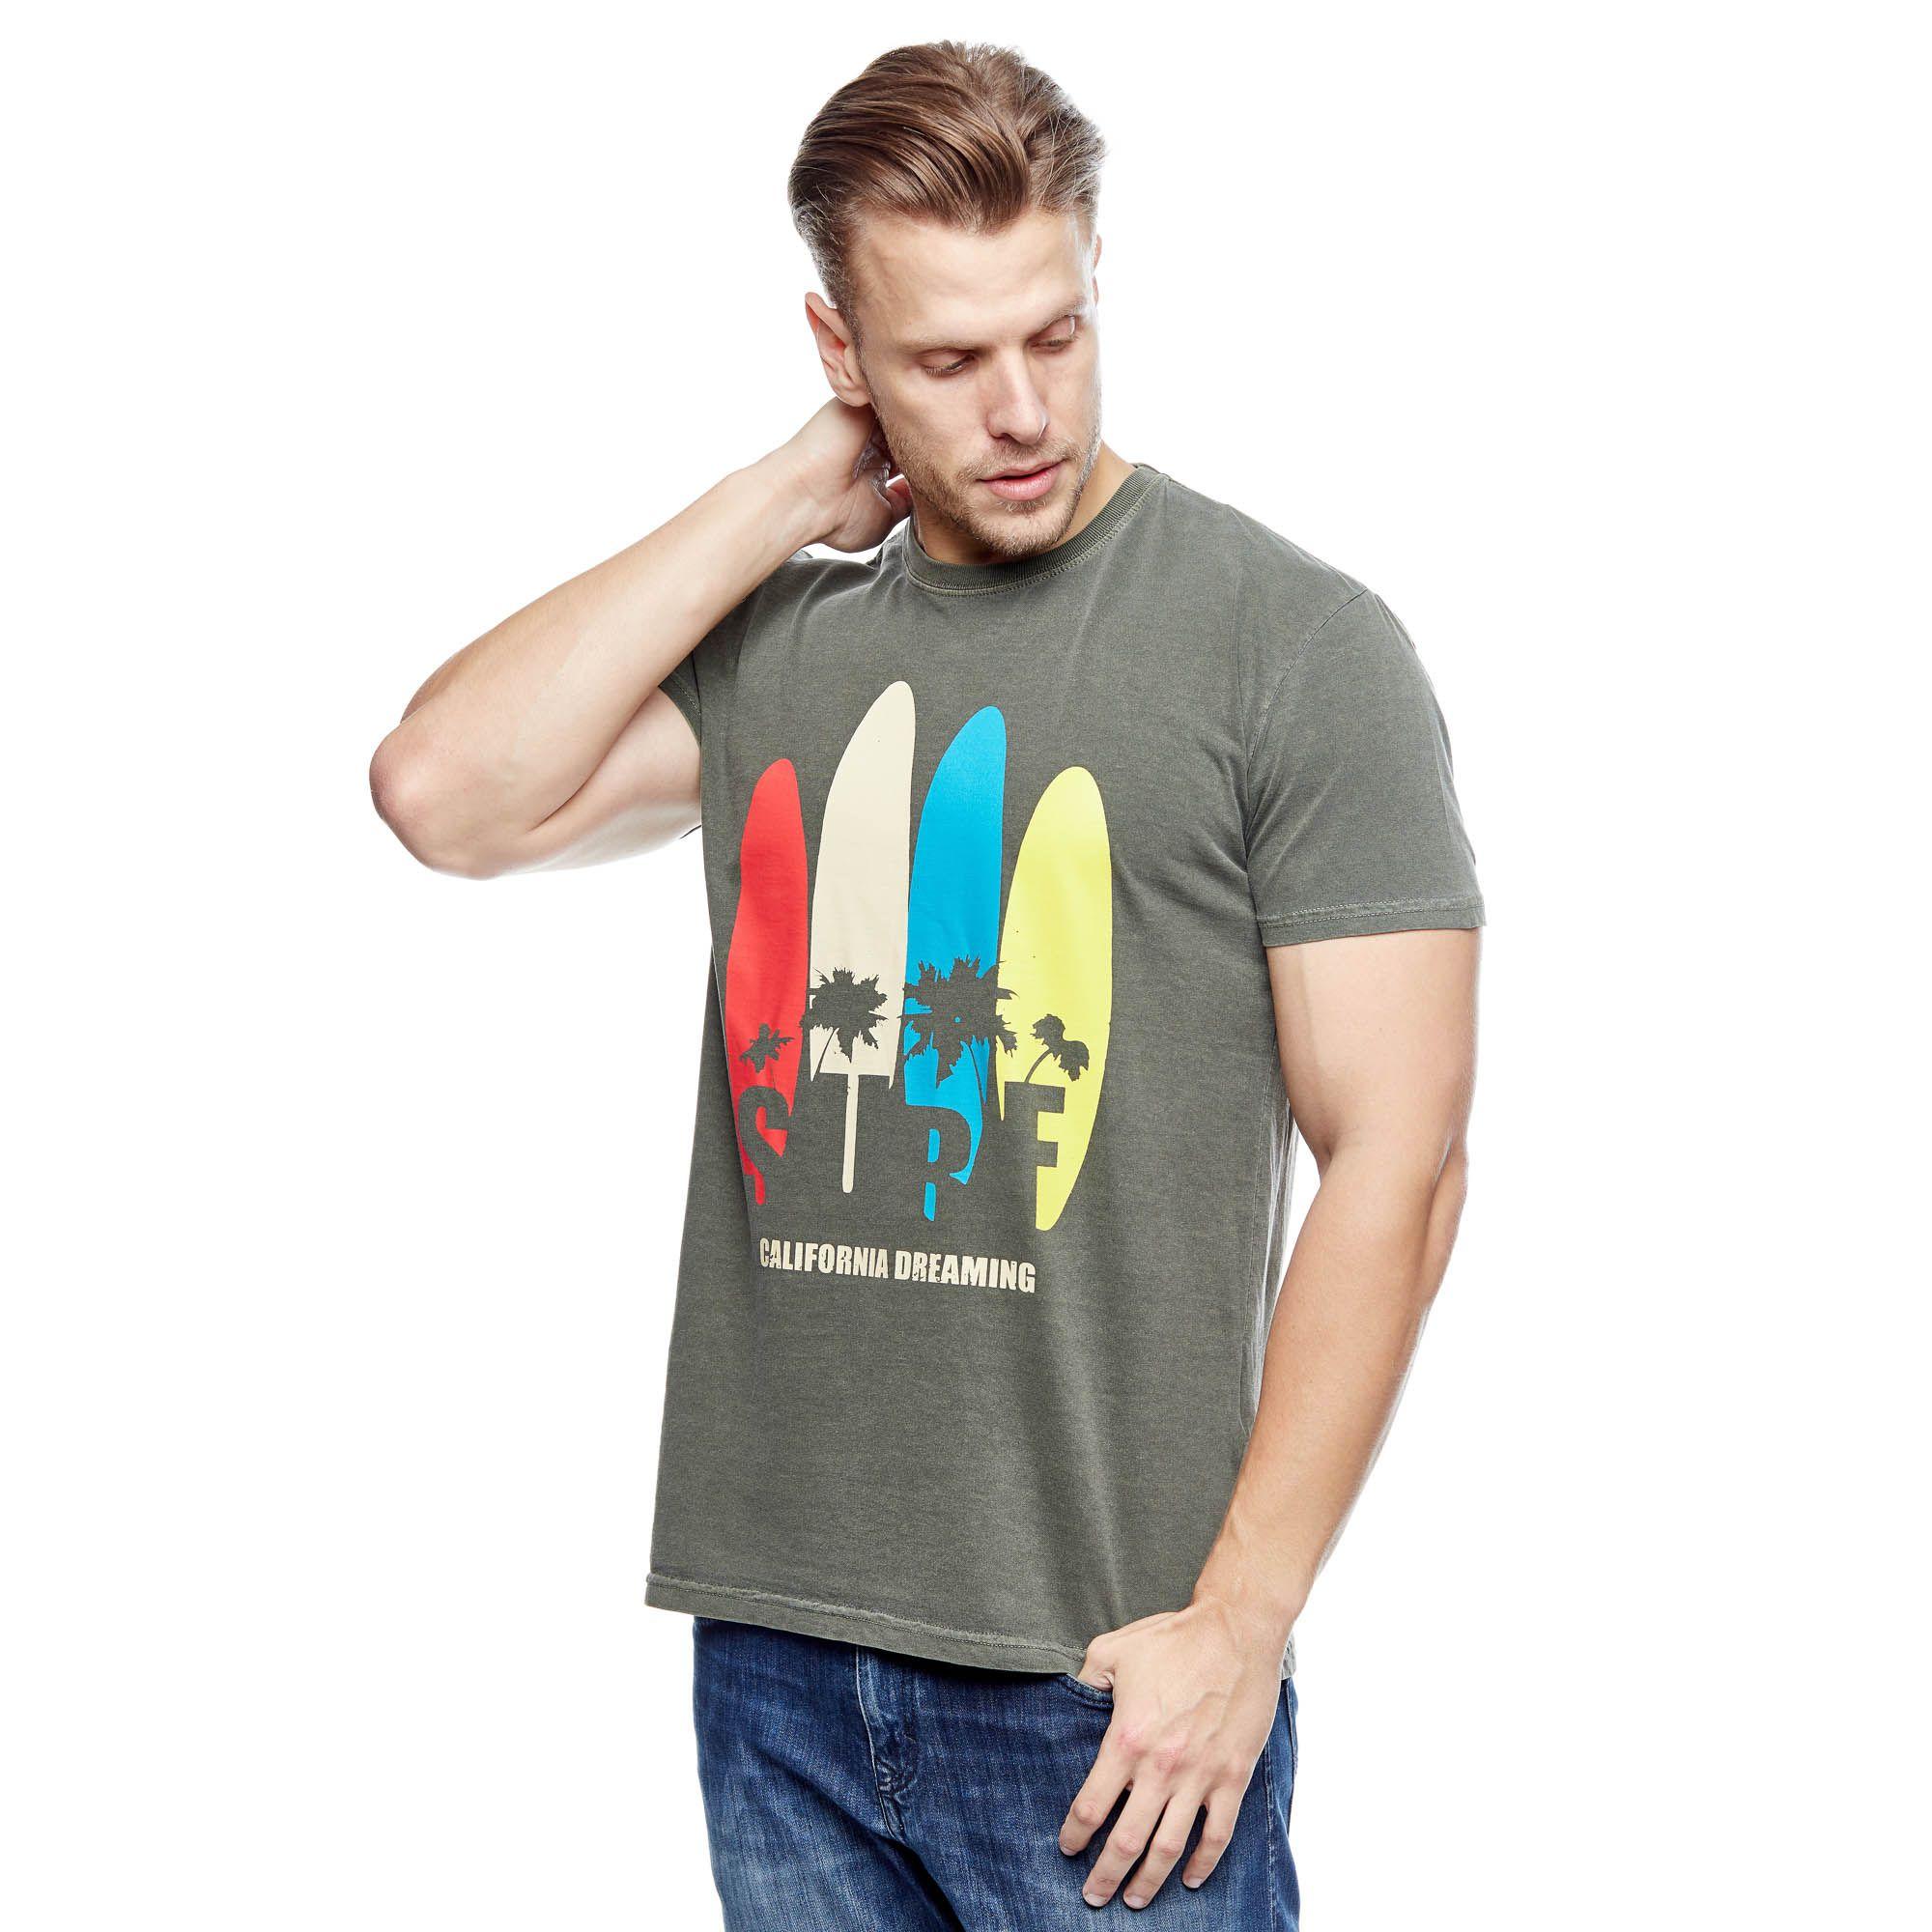 Camiseta Evolvee California Dreaming Masculina